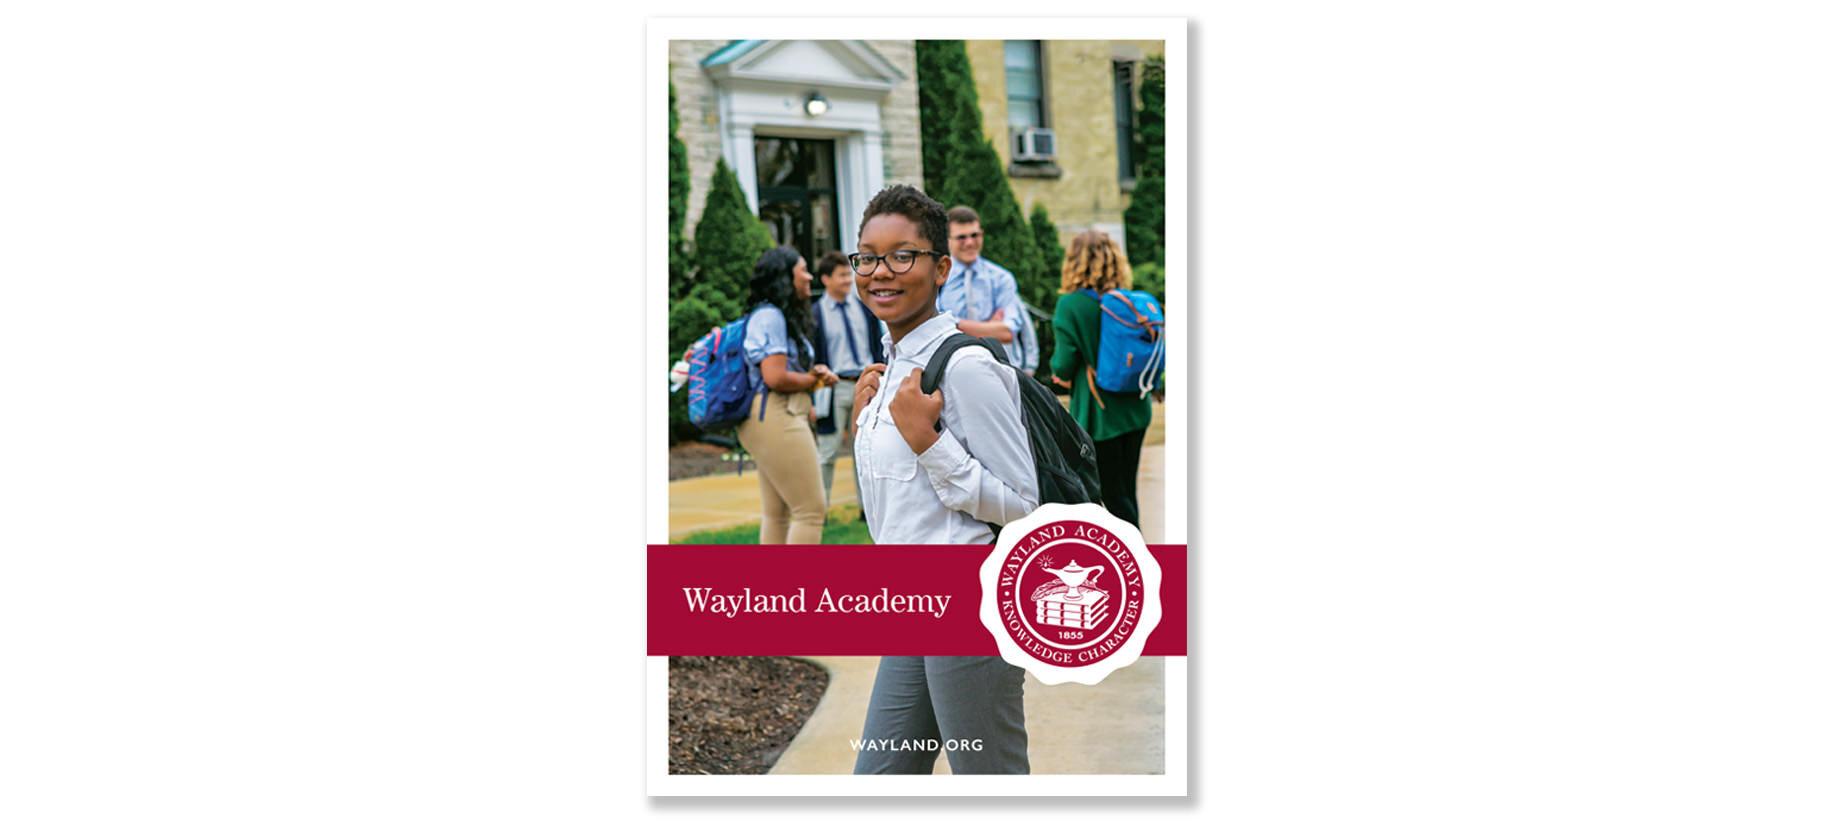 wayland-academy-search-piece-kelsh-wilson-cover.jpg